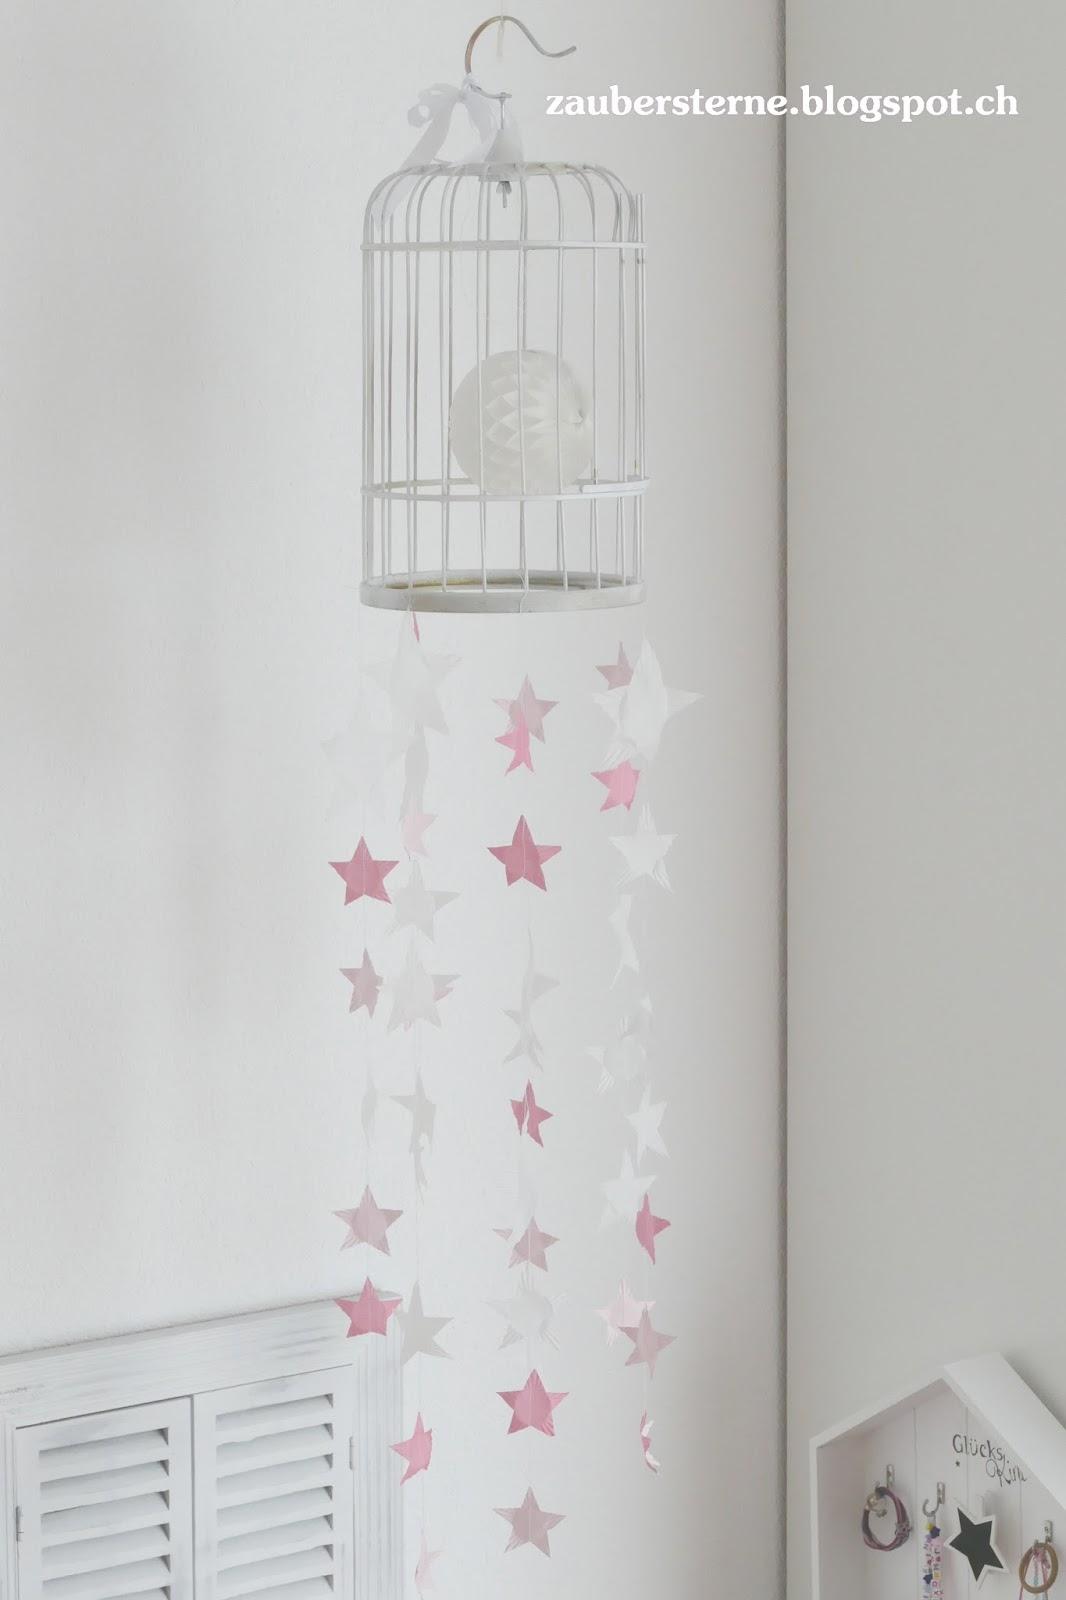 blog schweiz miriweber.ch : DIY Sternenvorhang